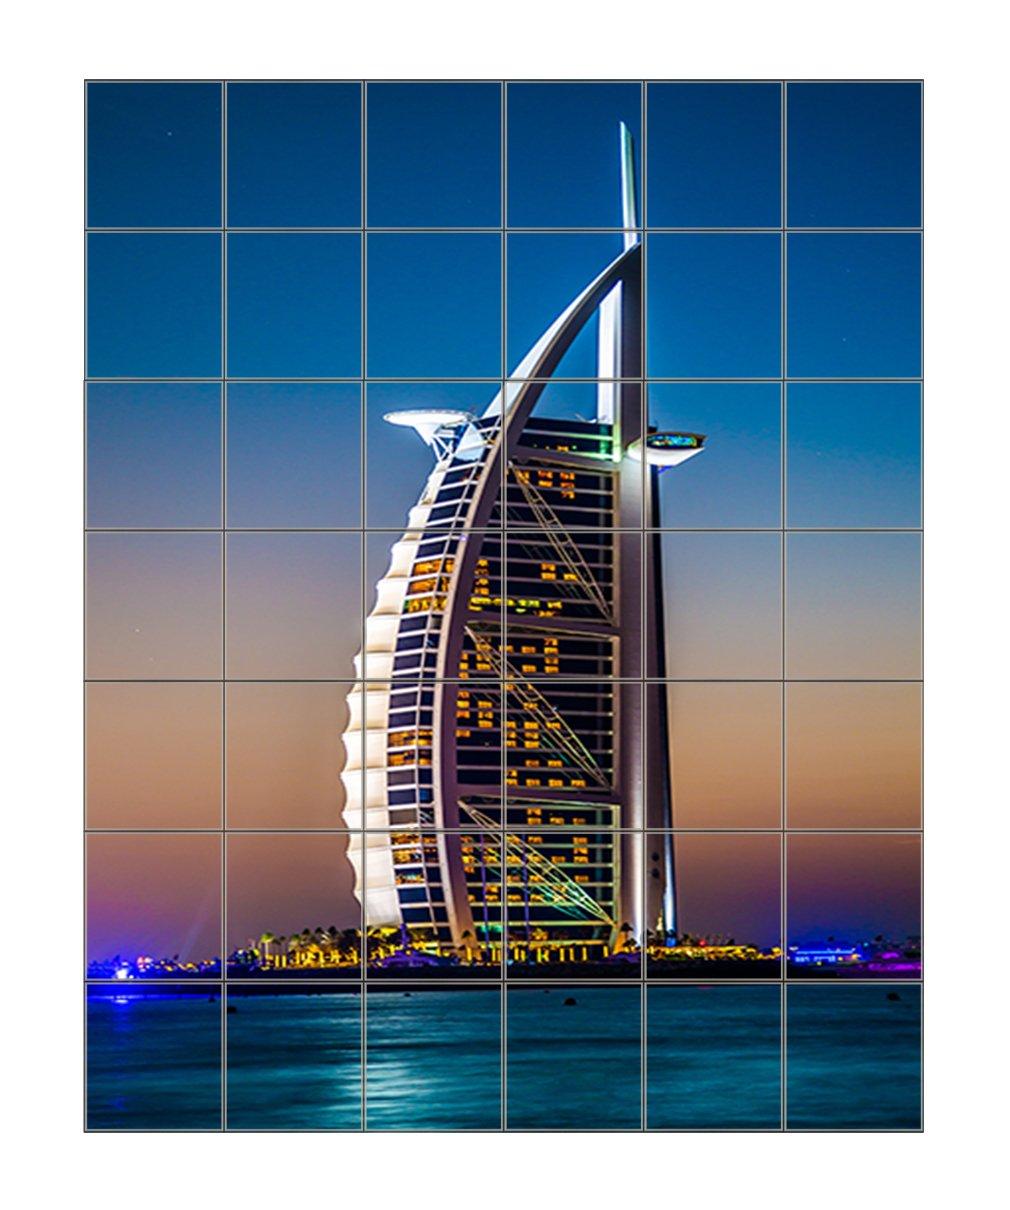 Burj Al Arab Is Luxury Stars Hotel Vertical Tile Mural Satin Finish 42''Hx36''W 6 Inch Tile by Style in Print (Image #1)